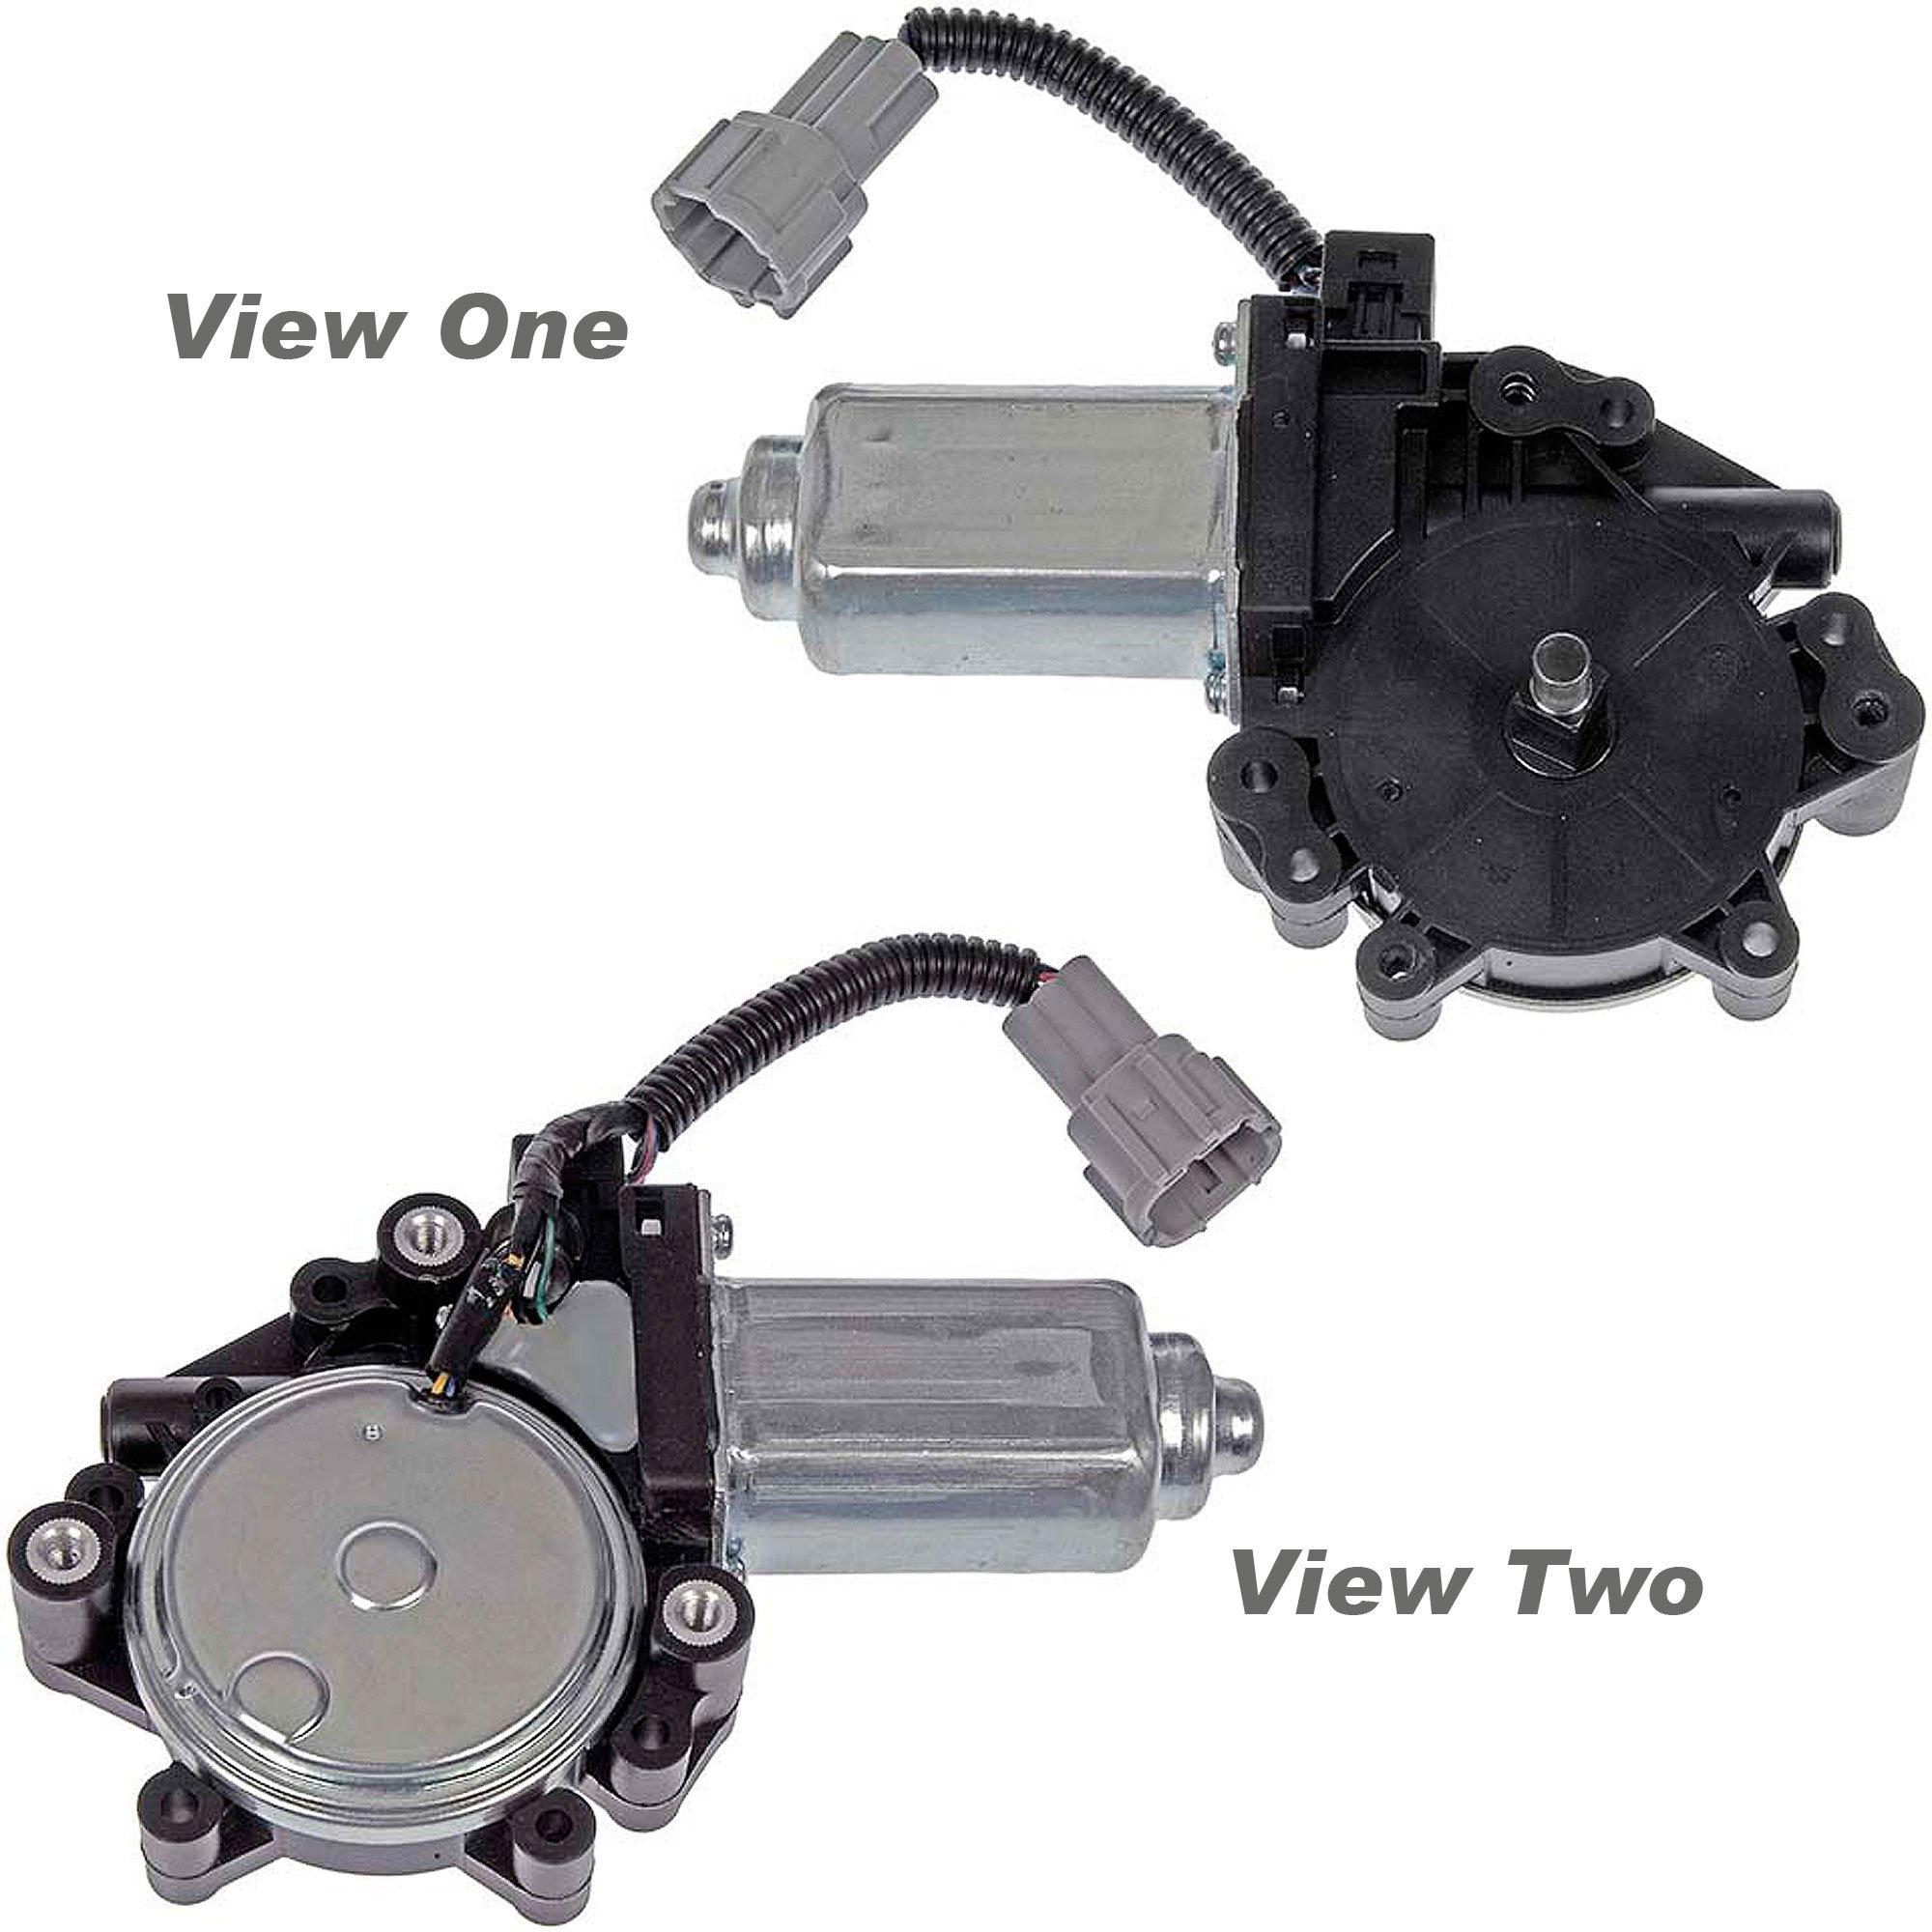 Fits Nissan Pathfinder Armada 2004-2005 Double DIN Harness Radio Dash Kit